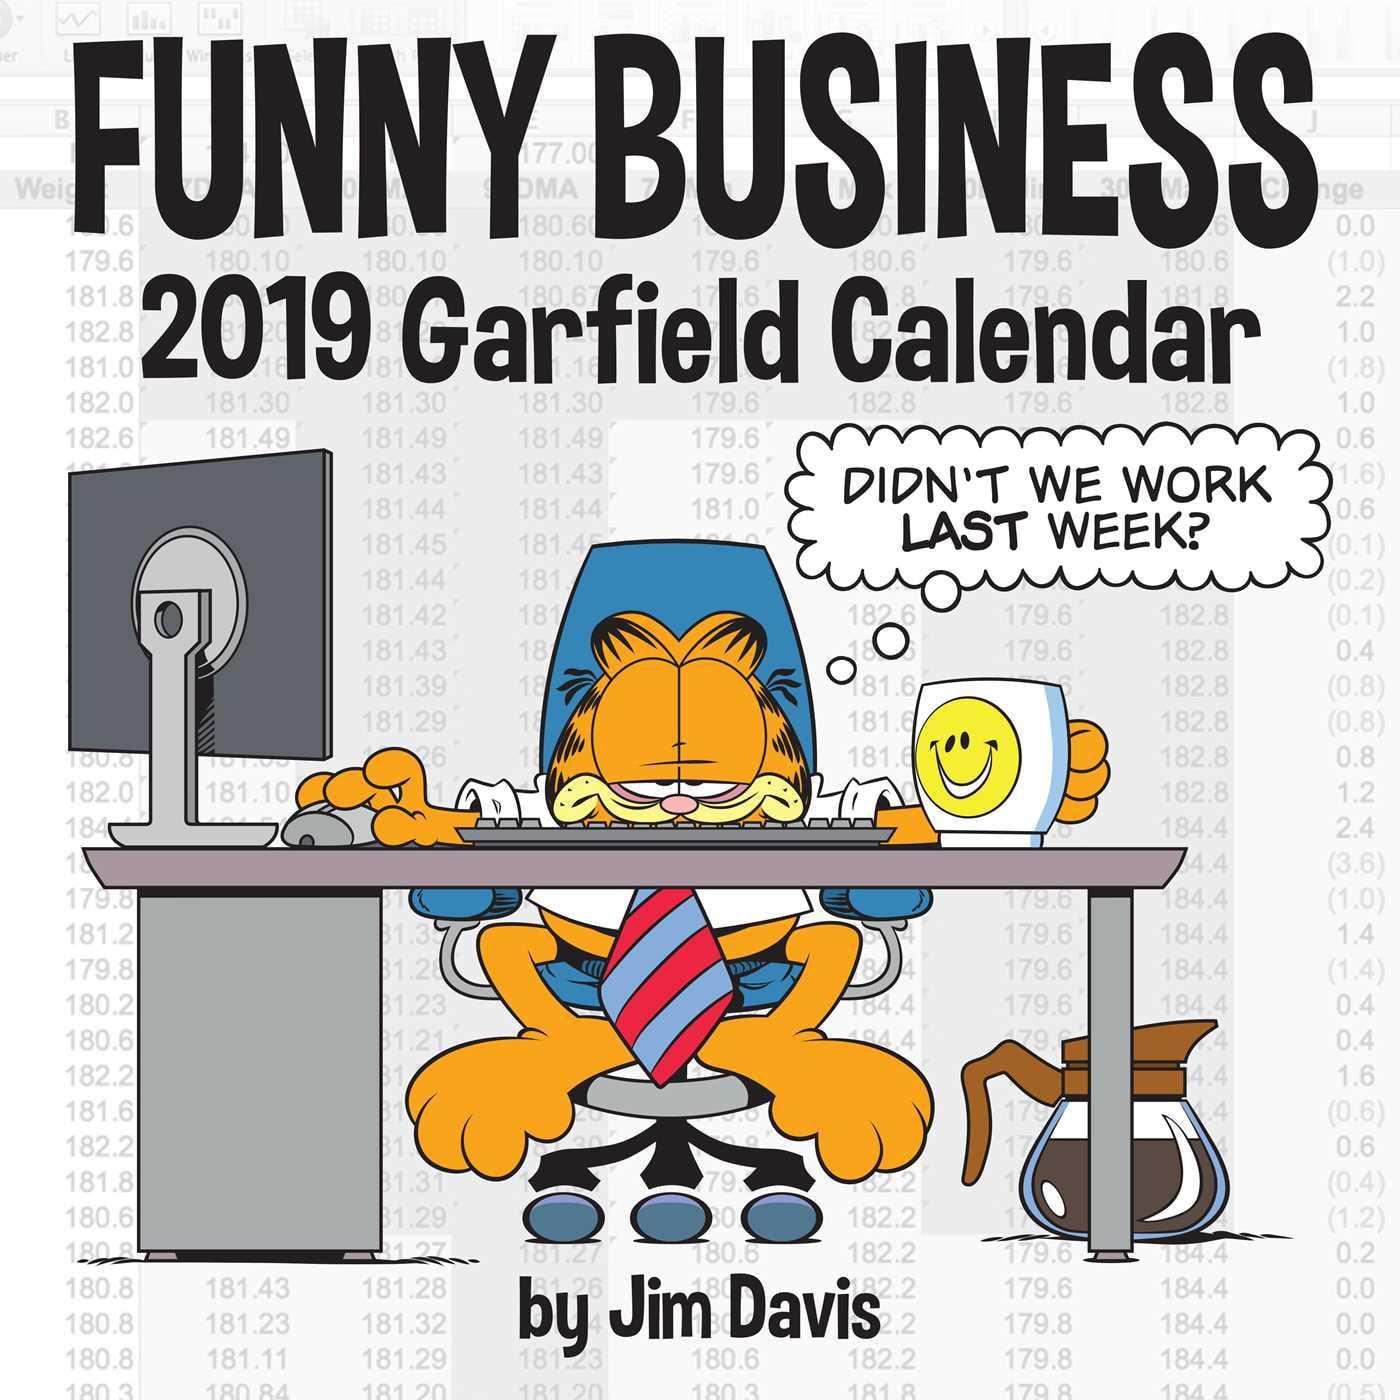 Garfield 2019 Wall Calendar: Funny Business (Other)